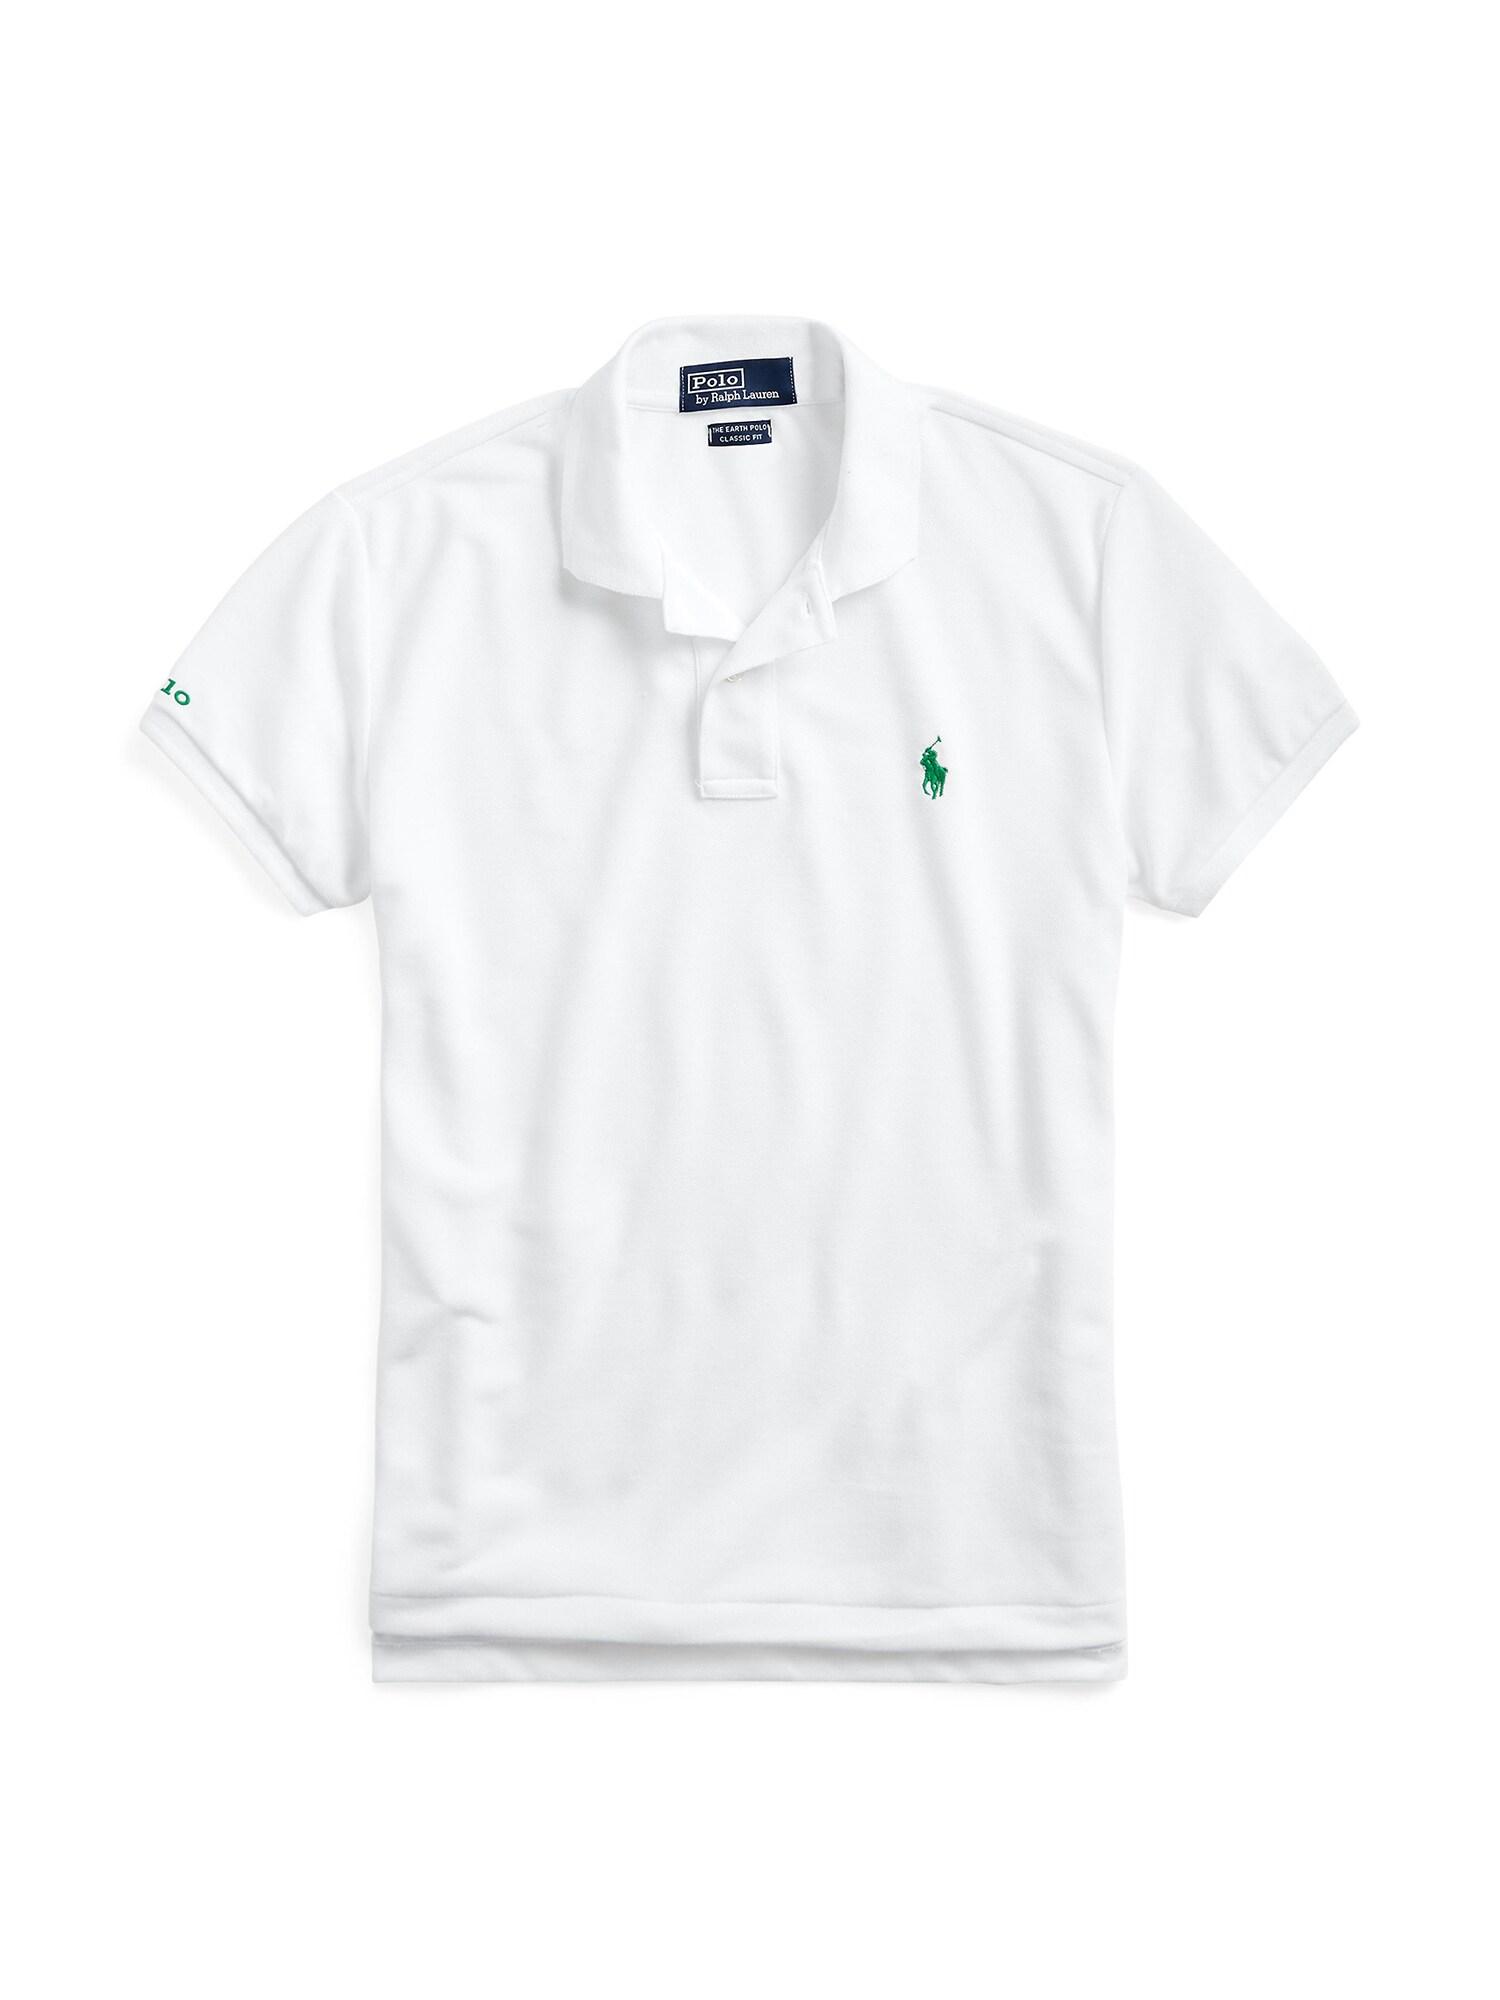 POLO RALPH LAUREN Marškinėliai 'CLASSIC FIT' balta